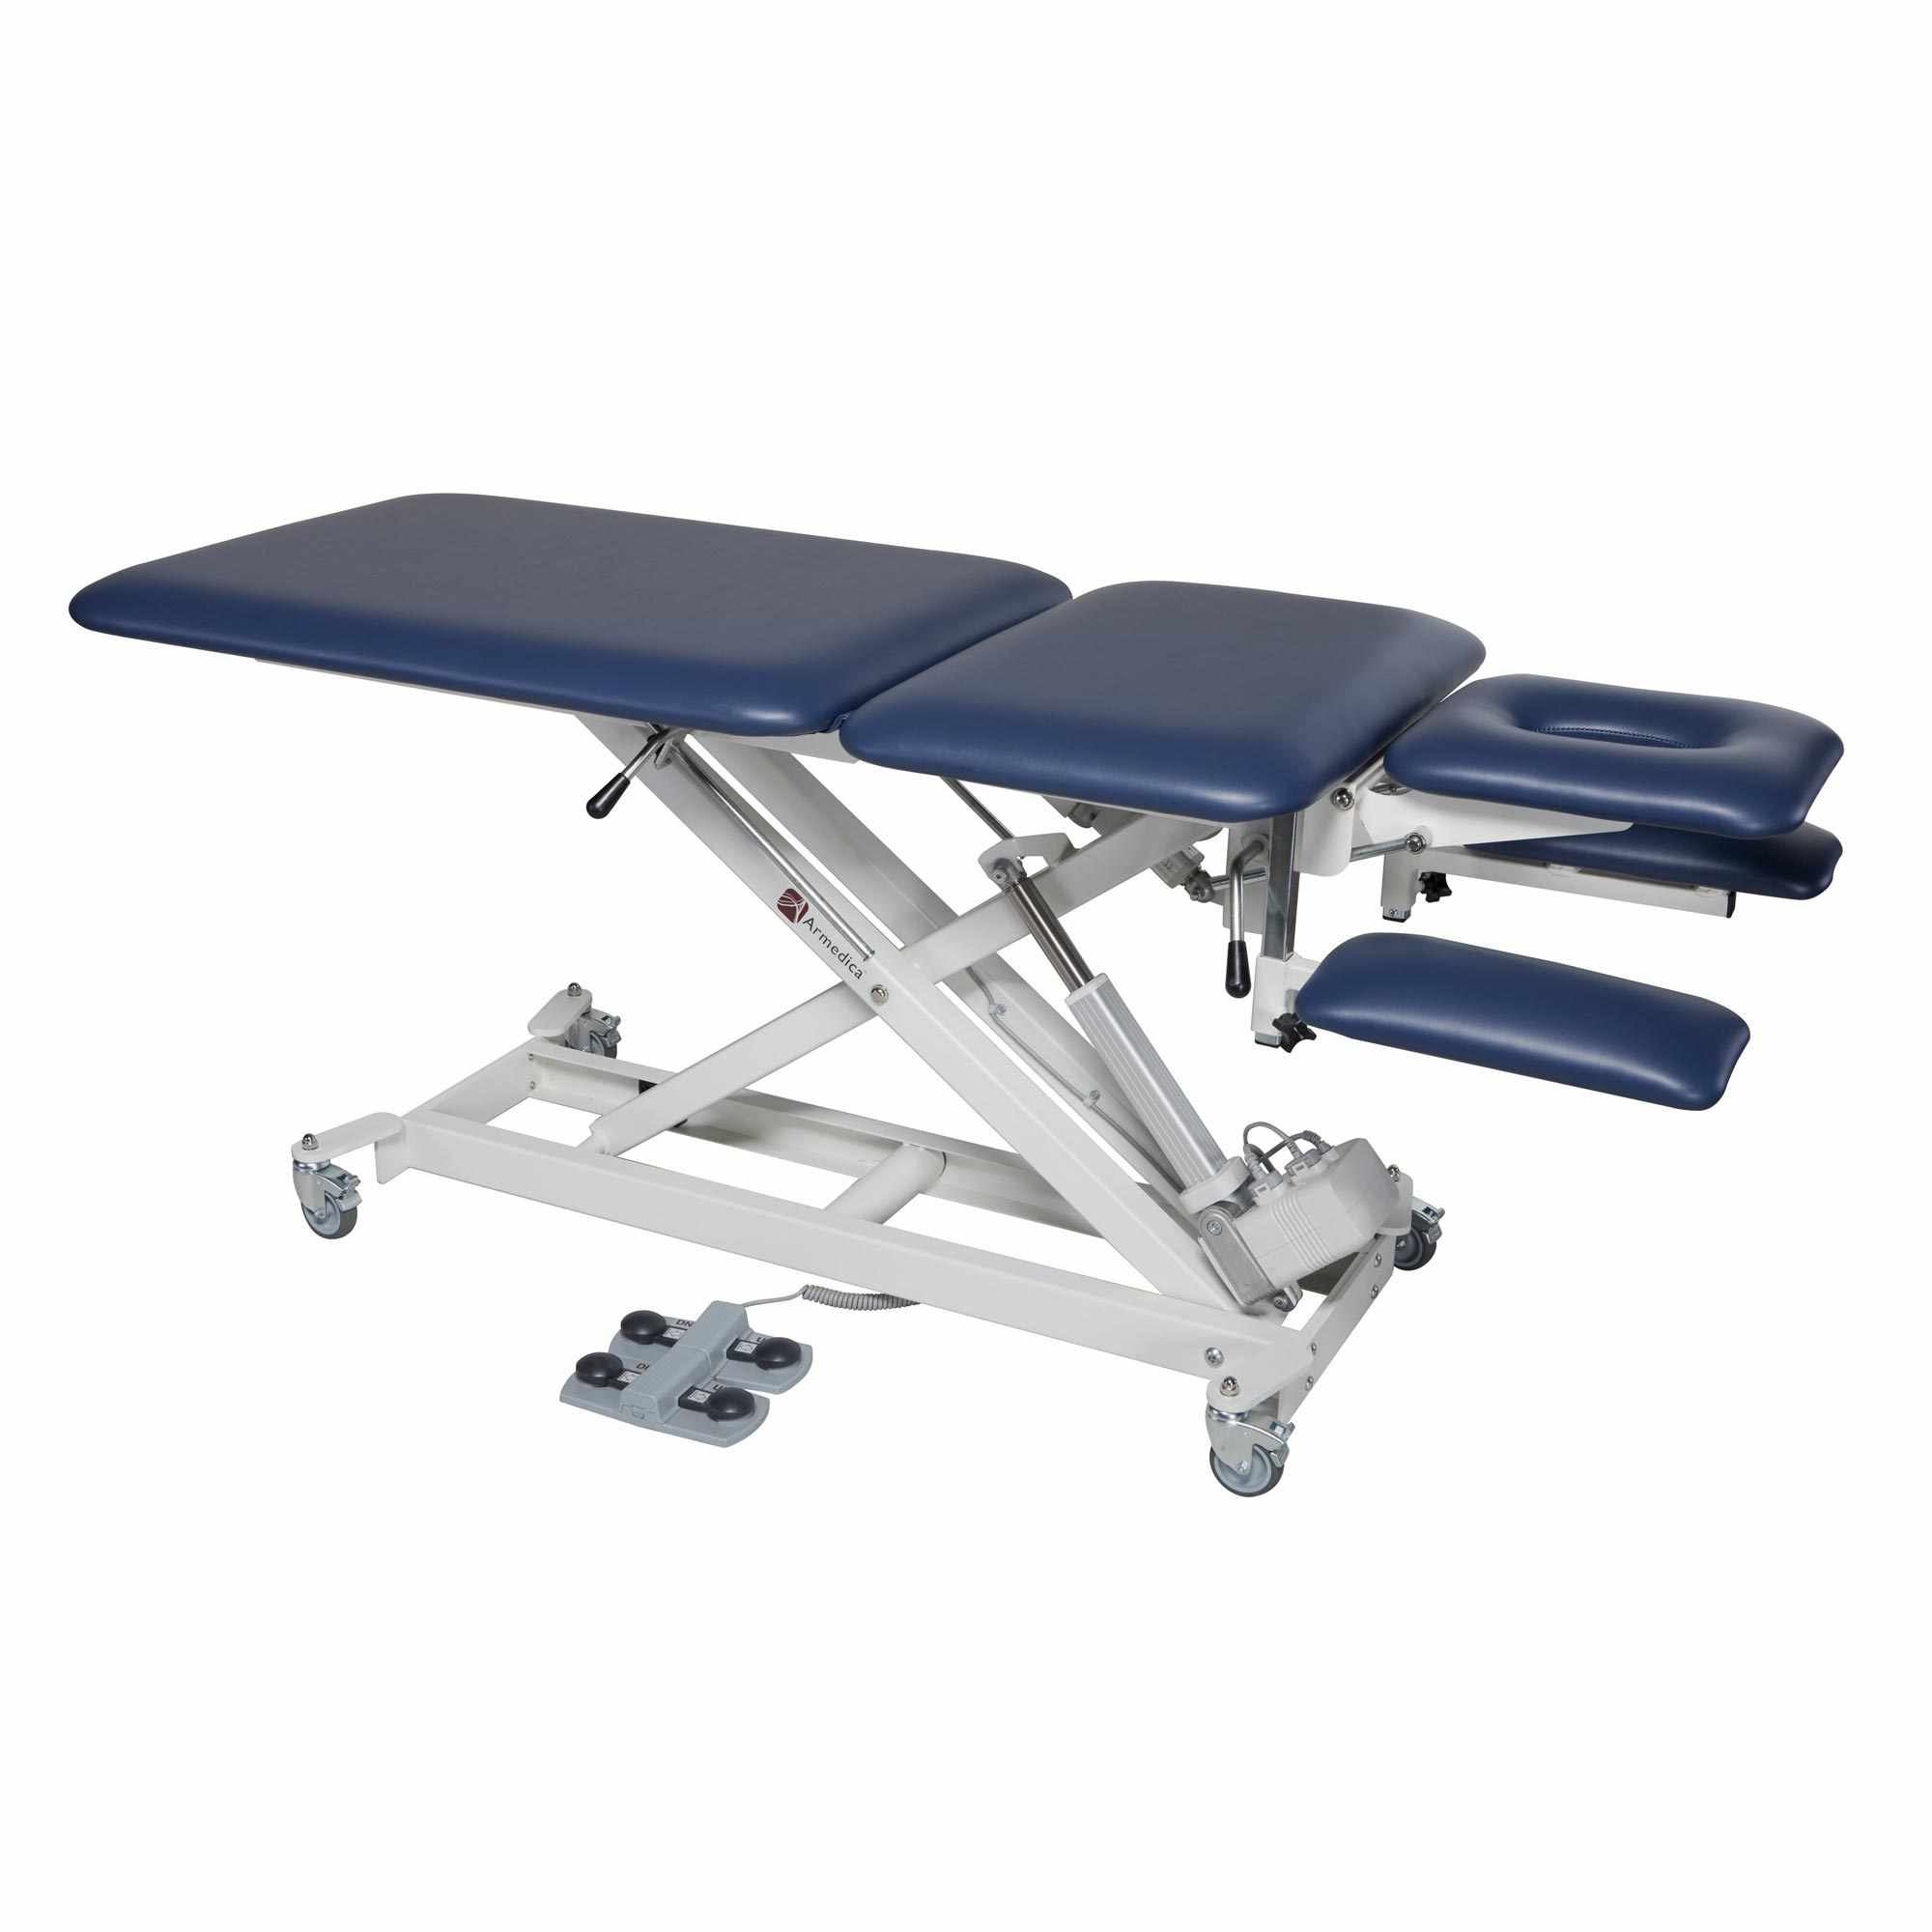 Armedica AM-SX 5000 treatment table